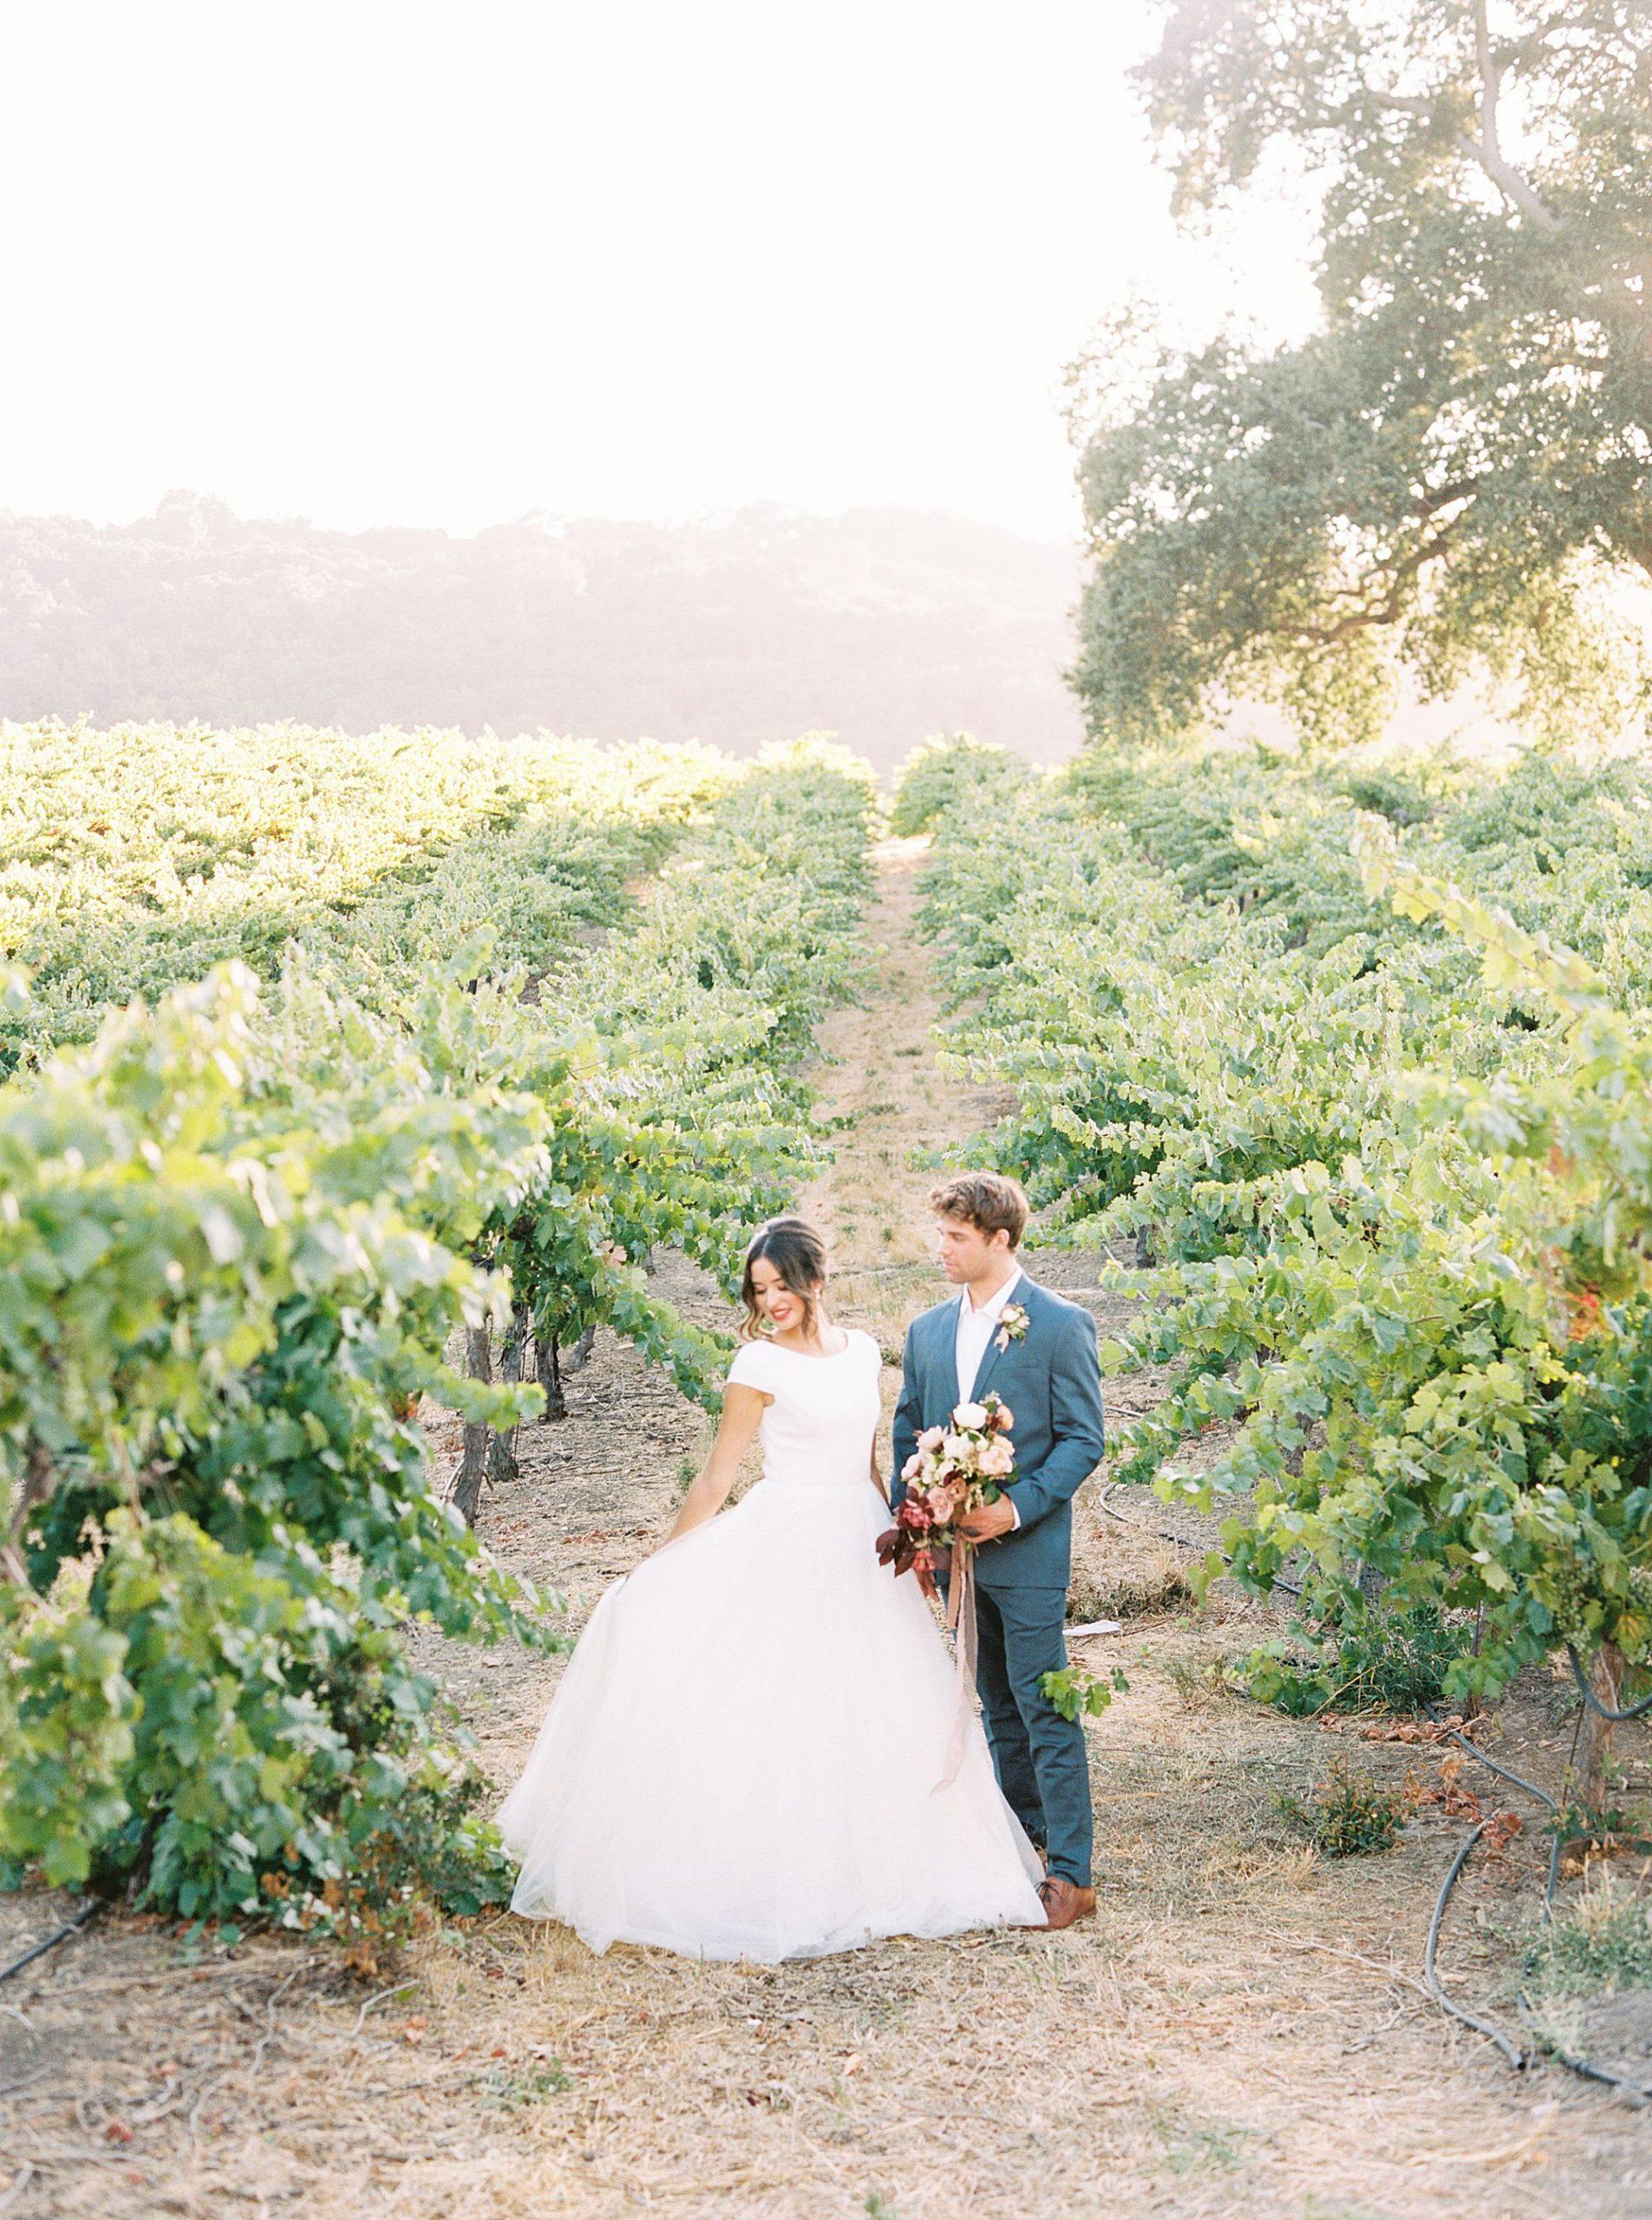 HammerSky Wedding Inspiration Featured on Hey Wedding Lady with Vanessa Noel Events - Ashley Baumgartner - SLO Wedding Photographer_0036.jpg